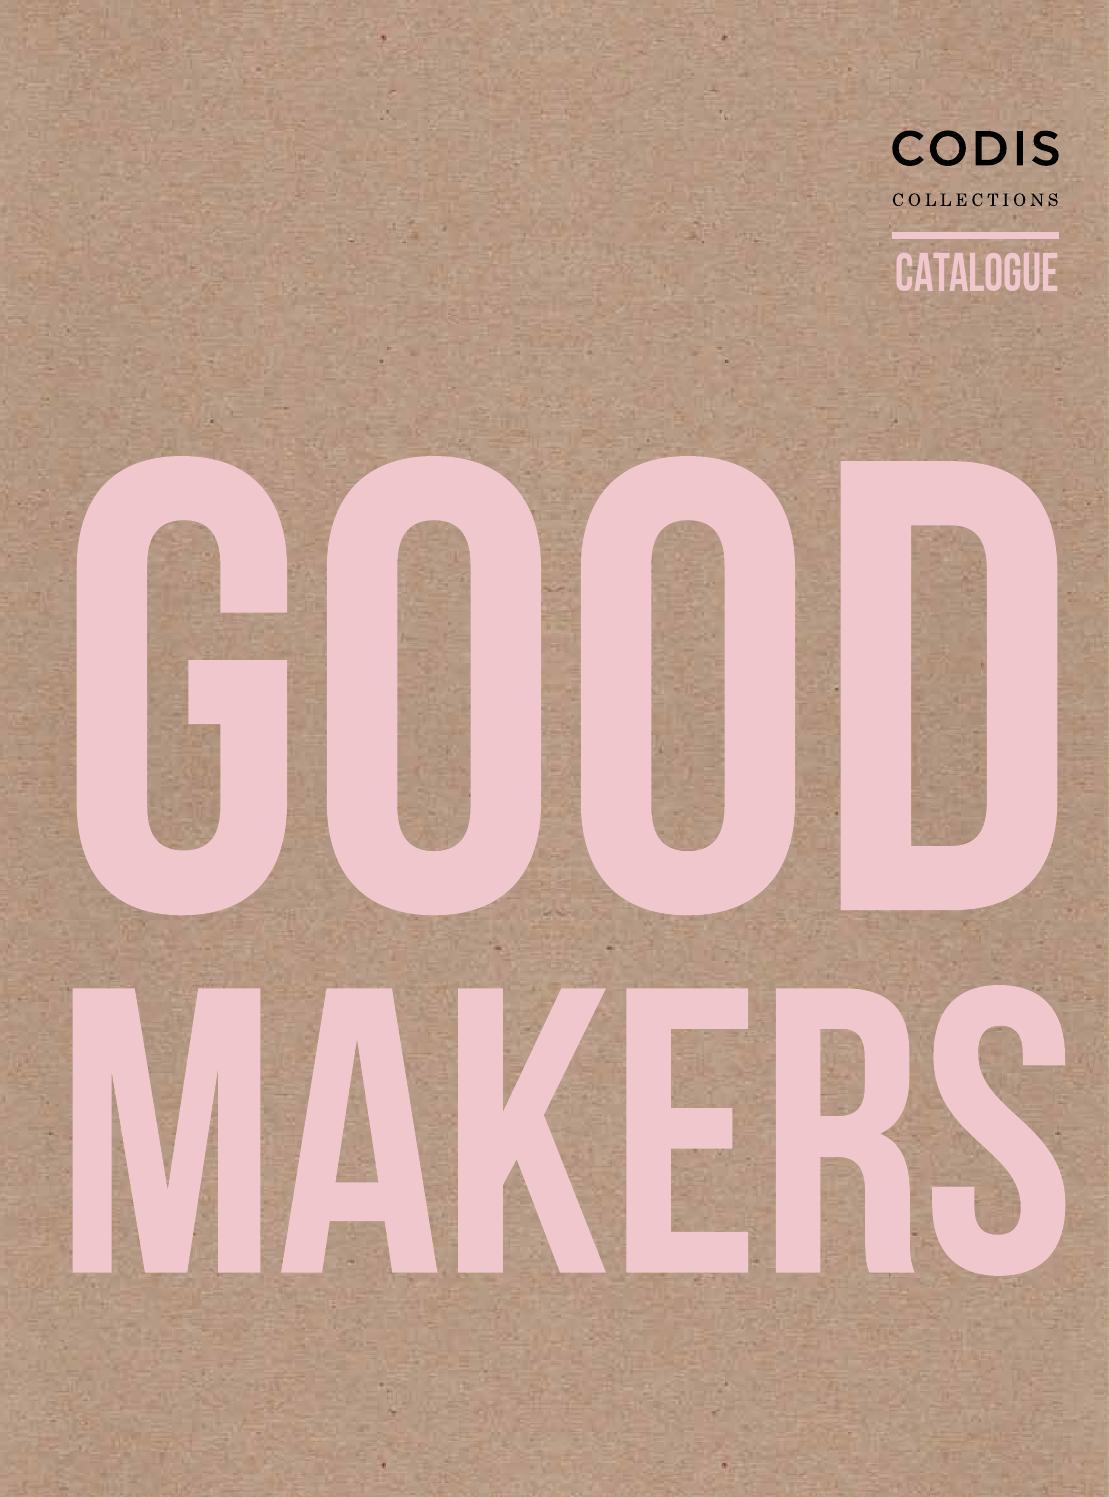 Betacryl Pure Acrylic Stone codis goodmakers 2016 english by codisbath - issuu